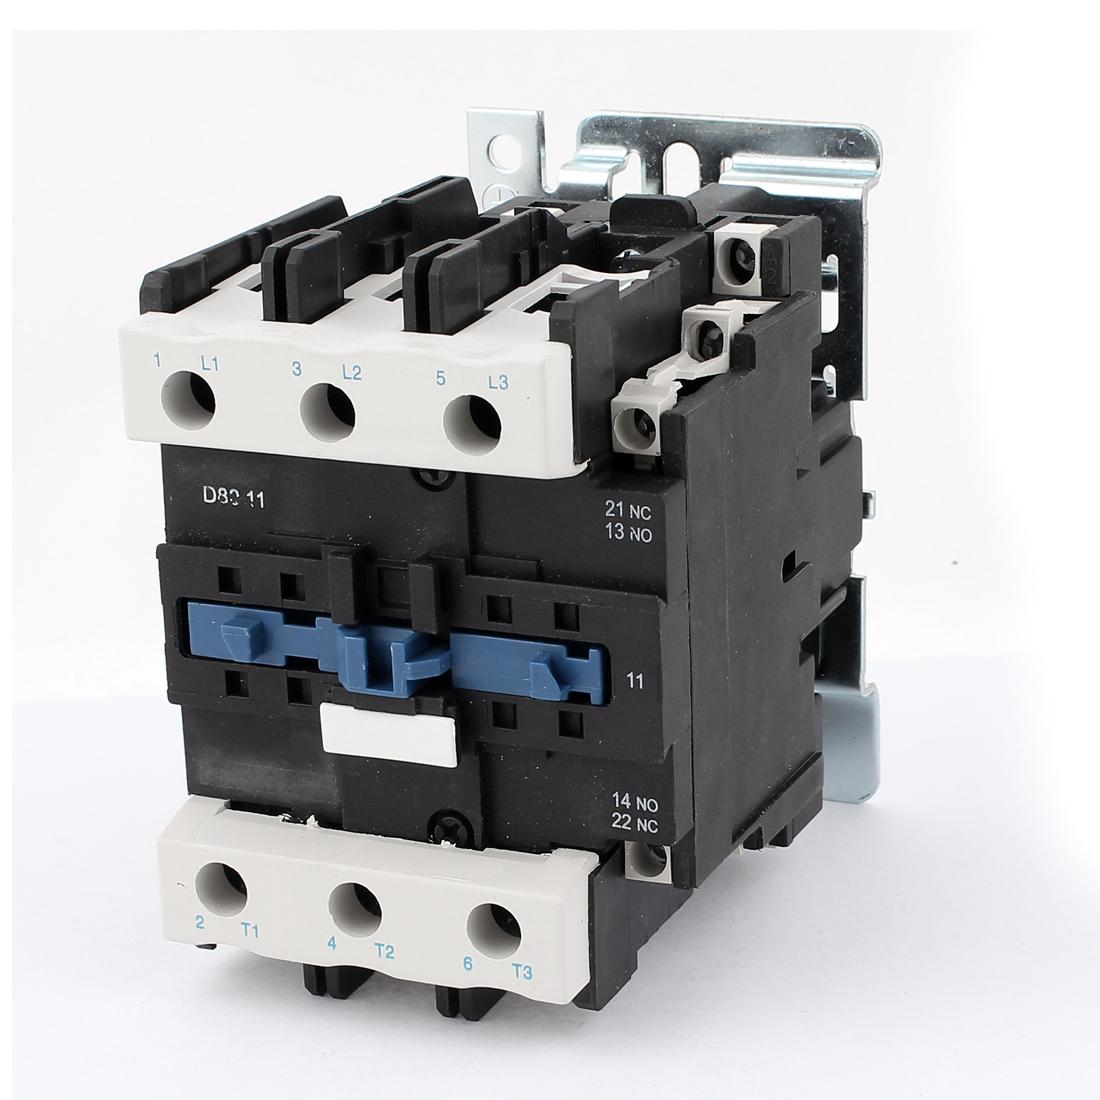 LC1-D8011 AC 220V 50/60 Hz Coil 80A AC Contactor 1NO + 1NC